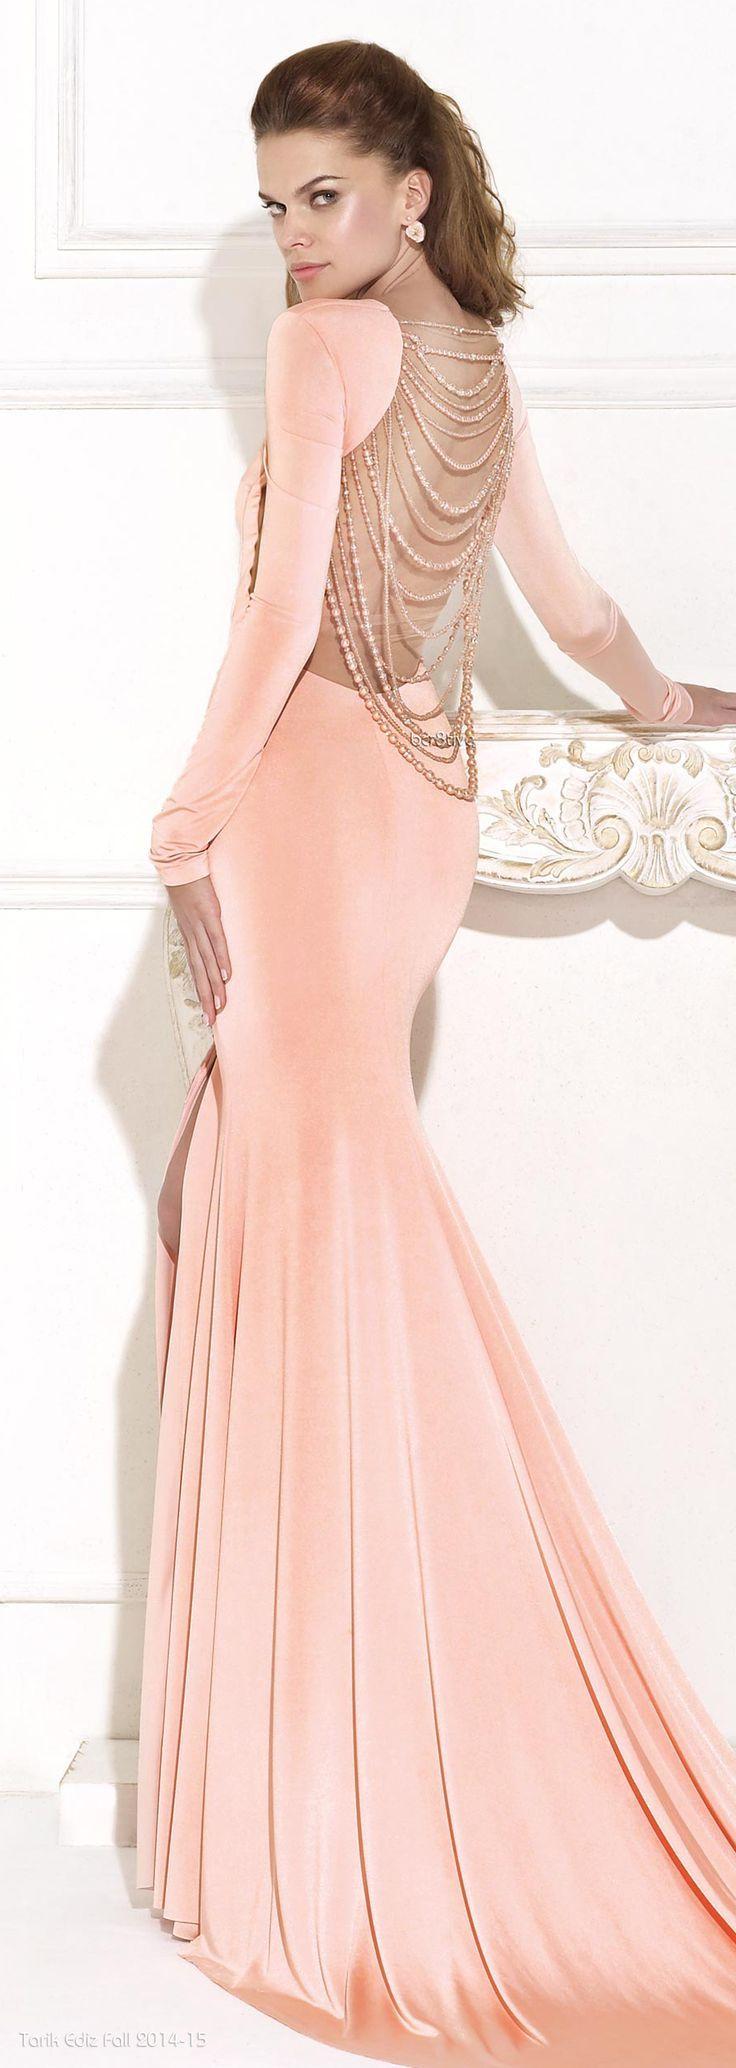 35 best Fashion - Tarik Ediz images on Pinterest | Evening gowns ...